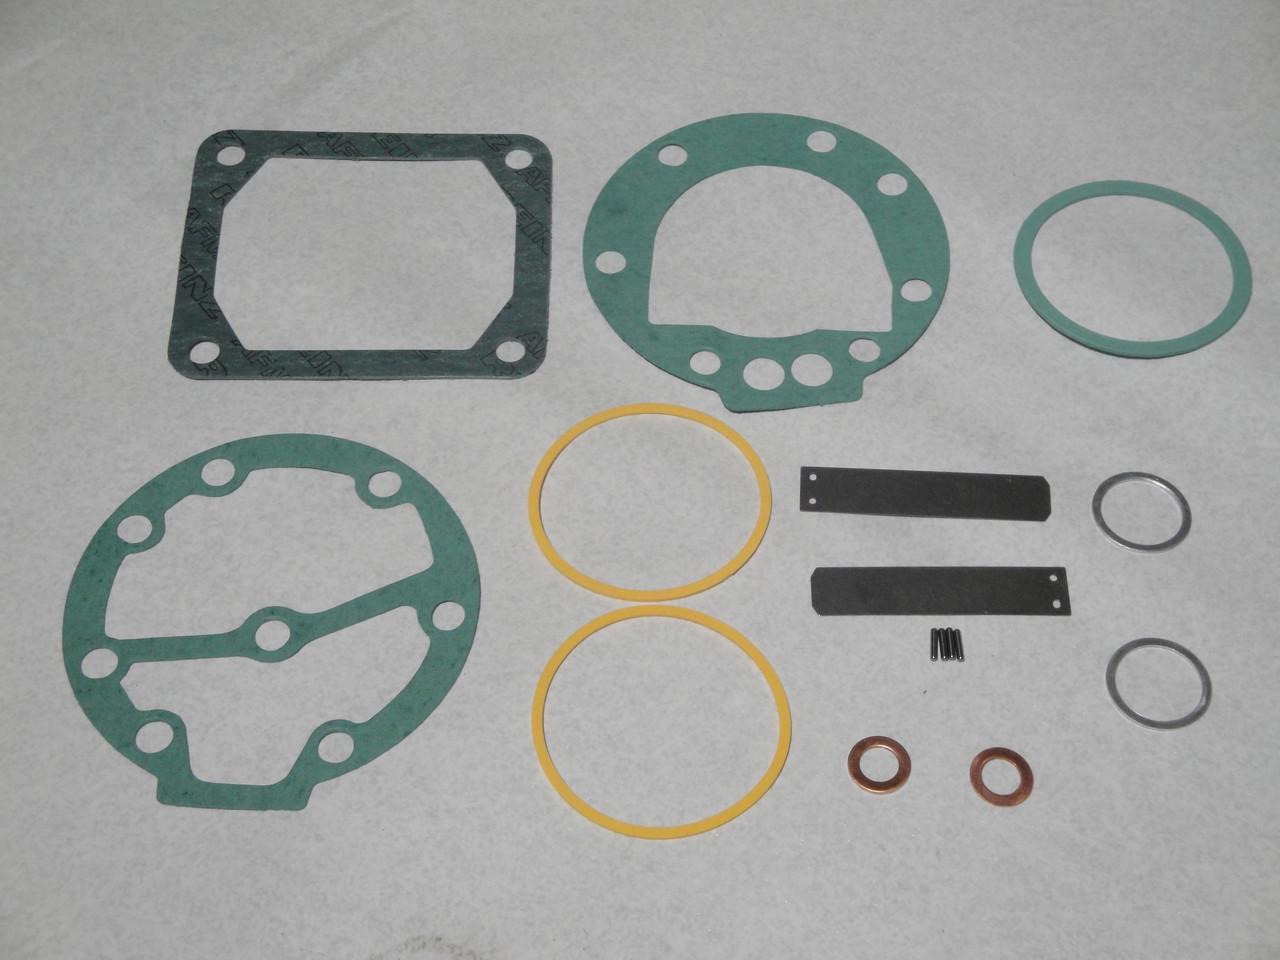 РМК компрессора прокладки с клапанами БОГДАН A091-A092 (MO076.170) MAPO